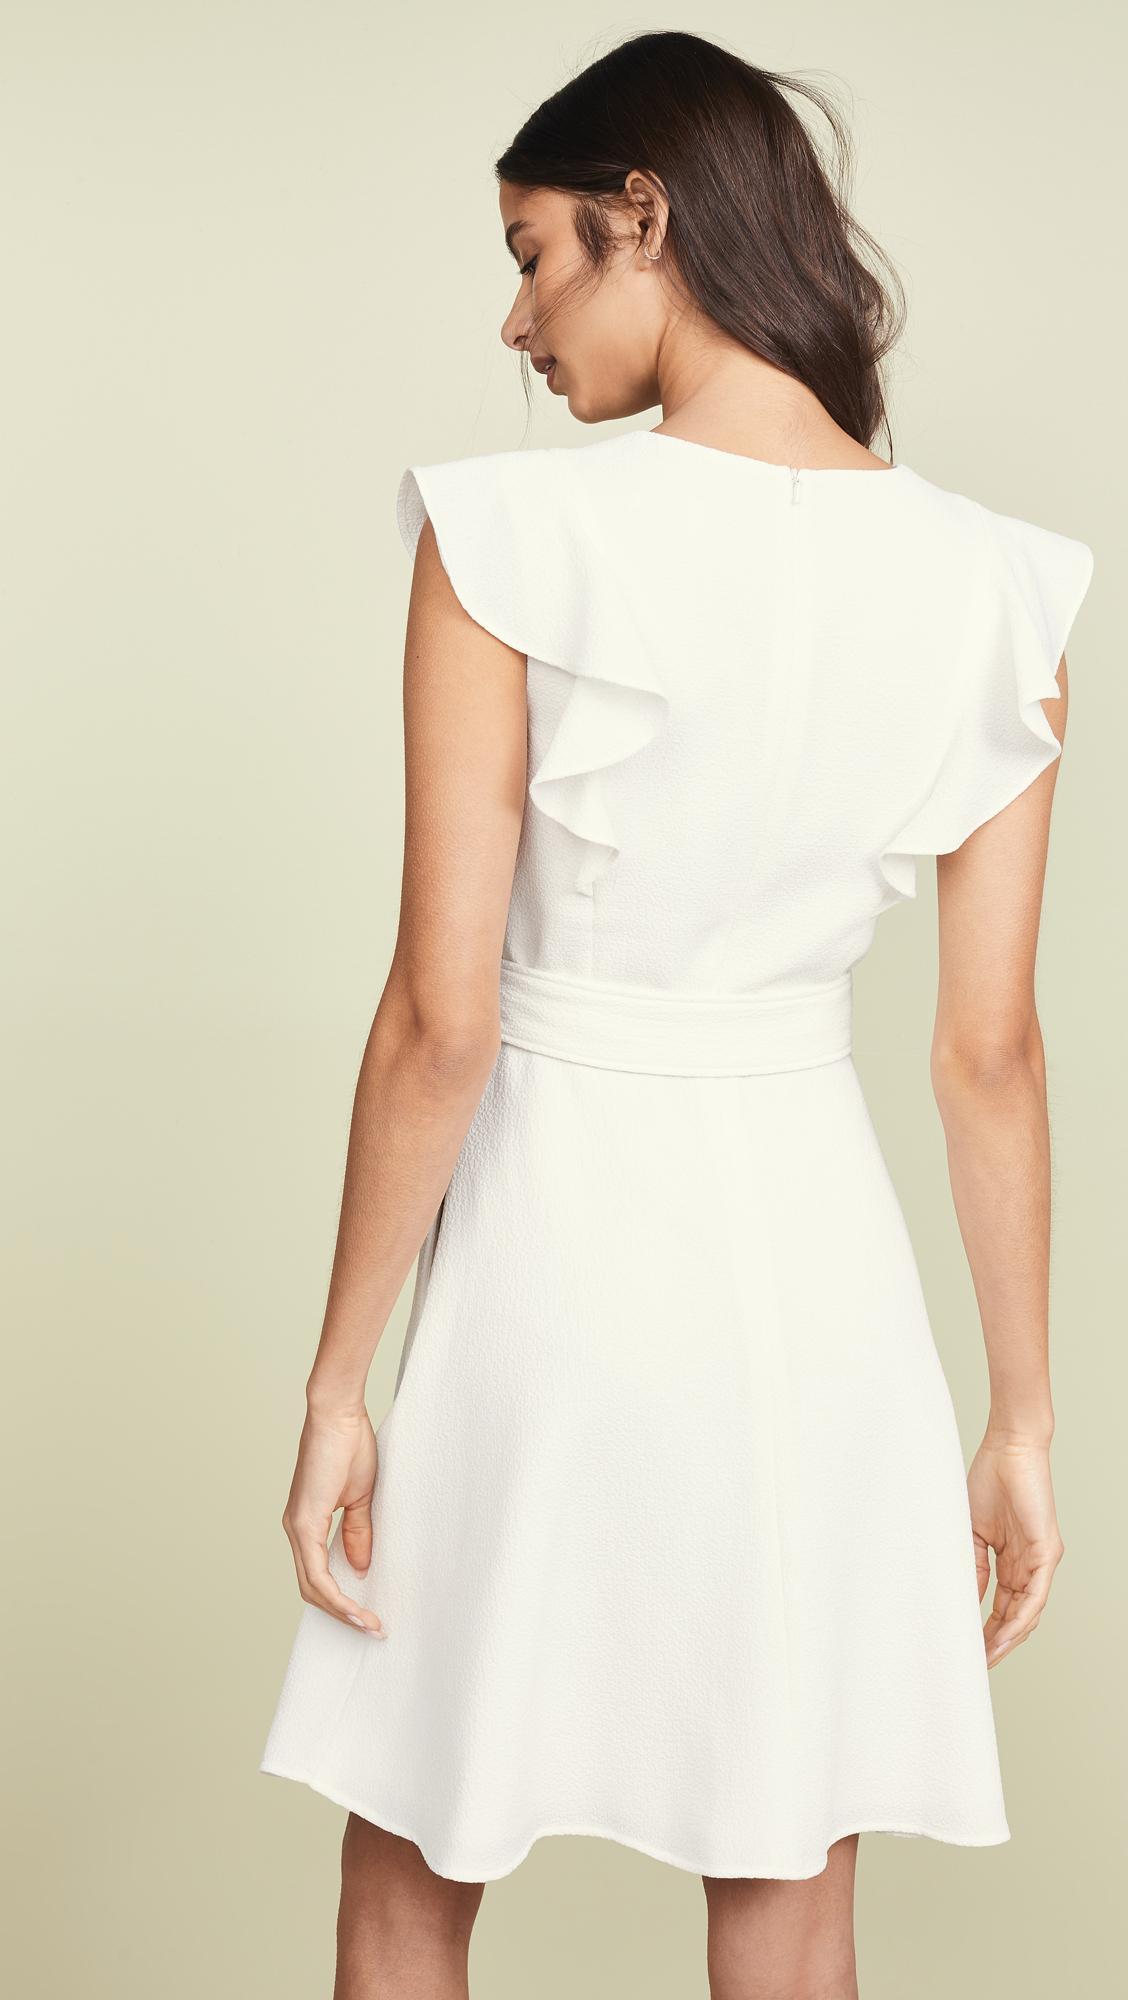 d2b75862f18 ... White Hailey Dress - Lyst. View fullscreen